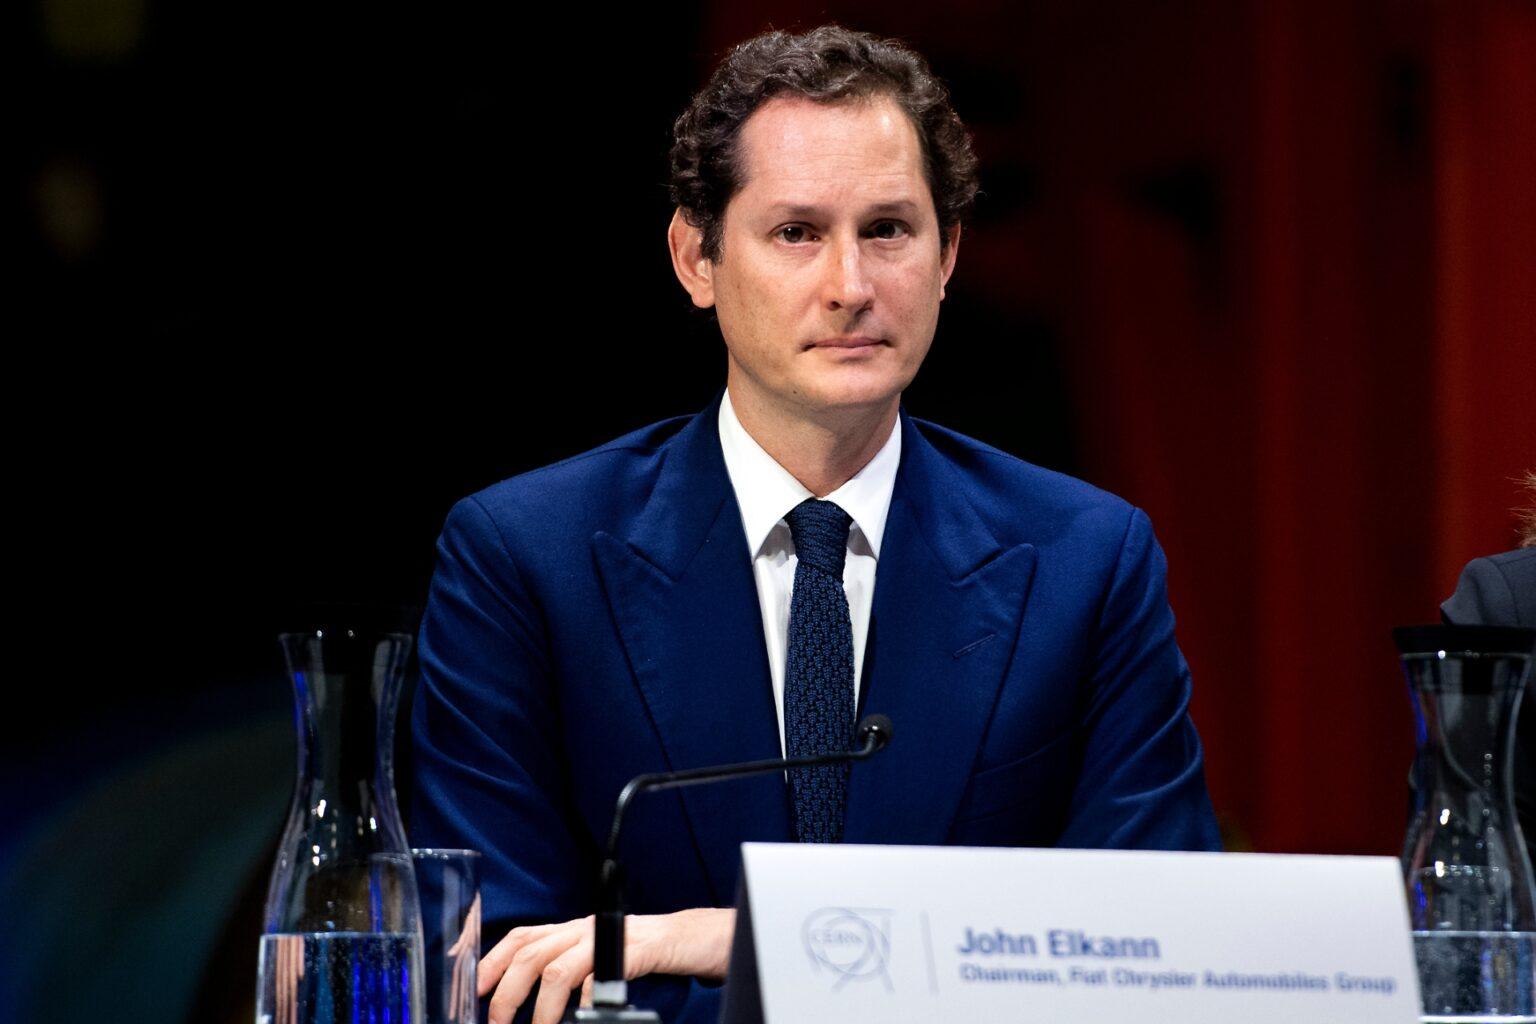 Foto di John Elkann Presidente Gruppo Ferrari